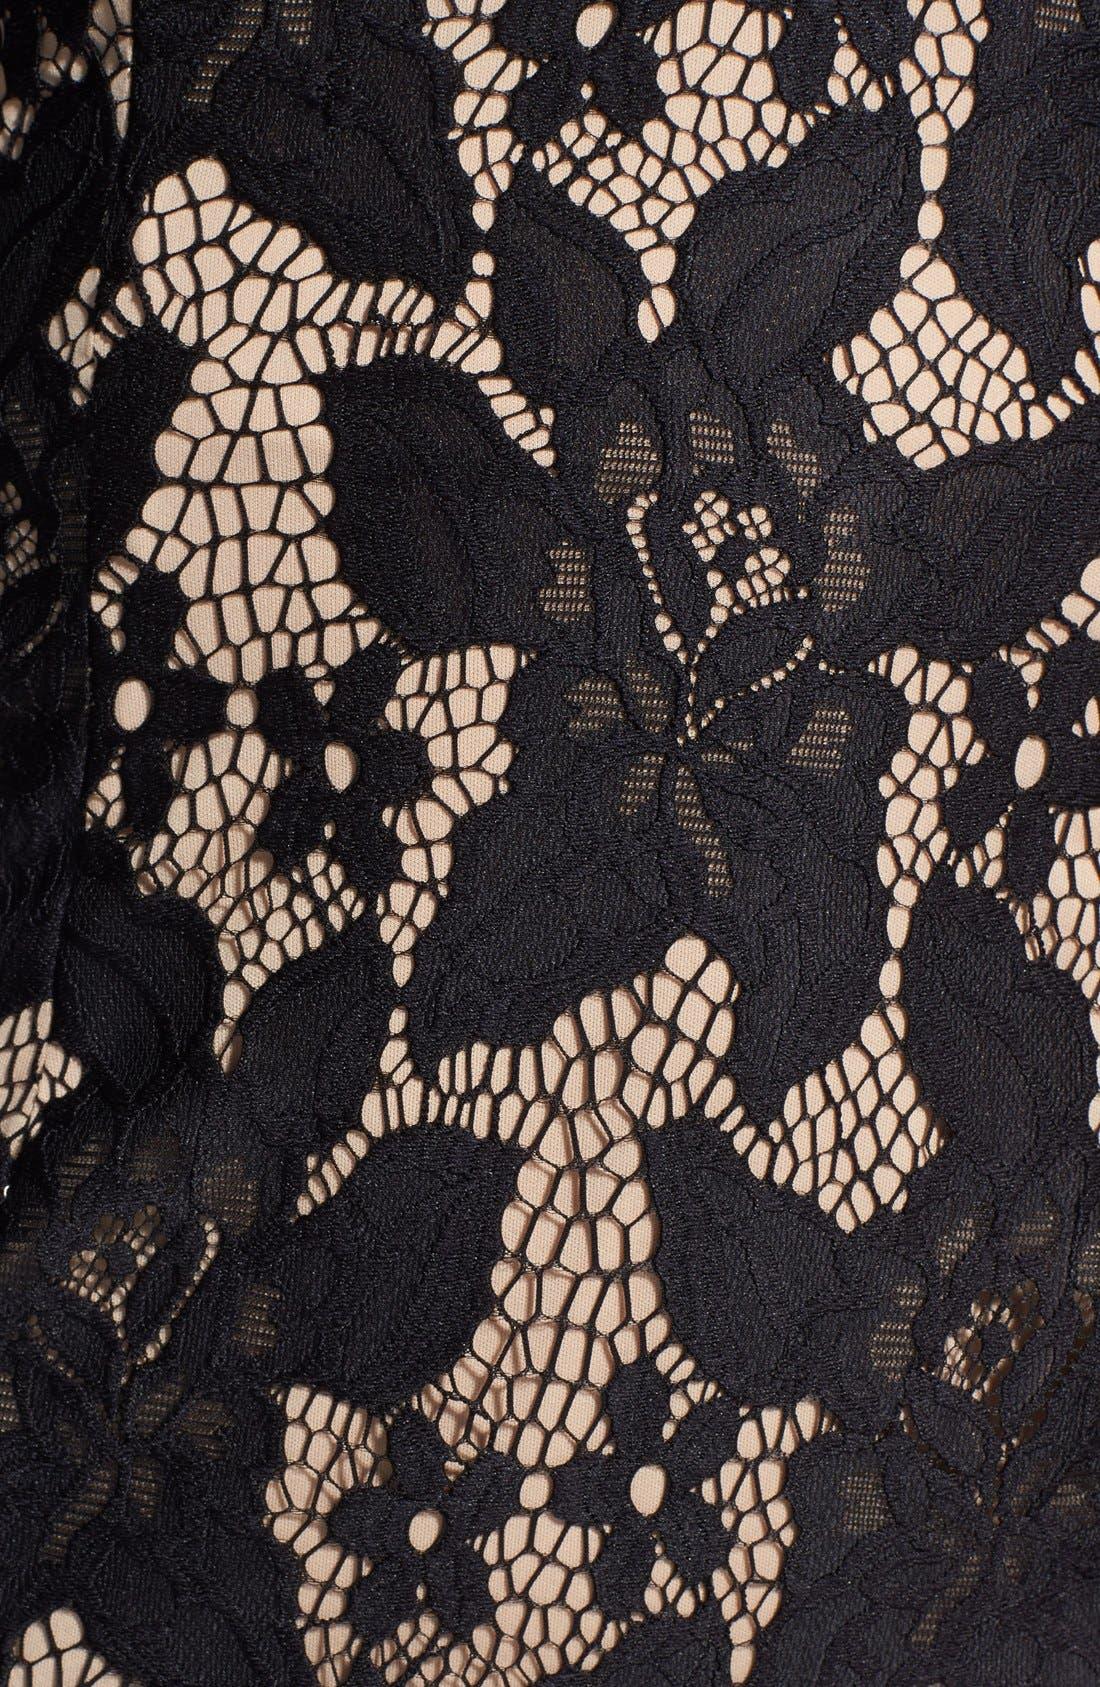 Long Sleeve Lace Cocktail Dress,                             Alternate thumbnail 4, color,                             001